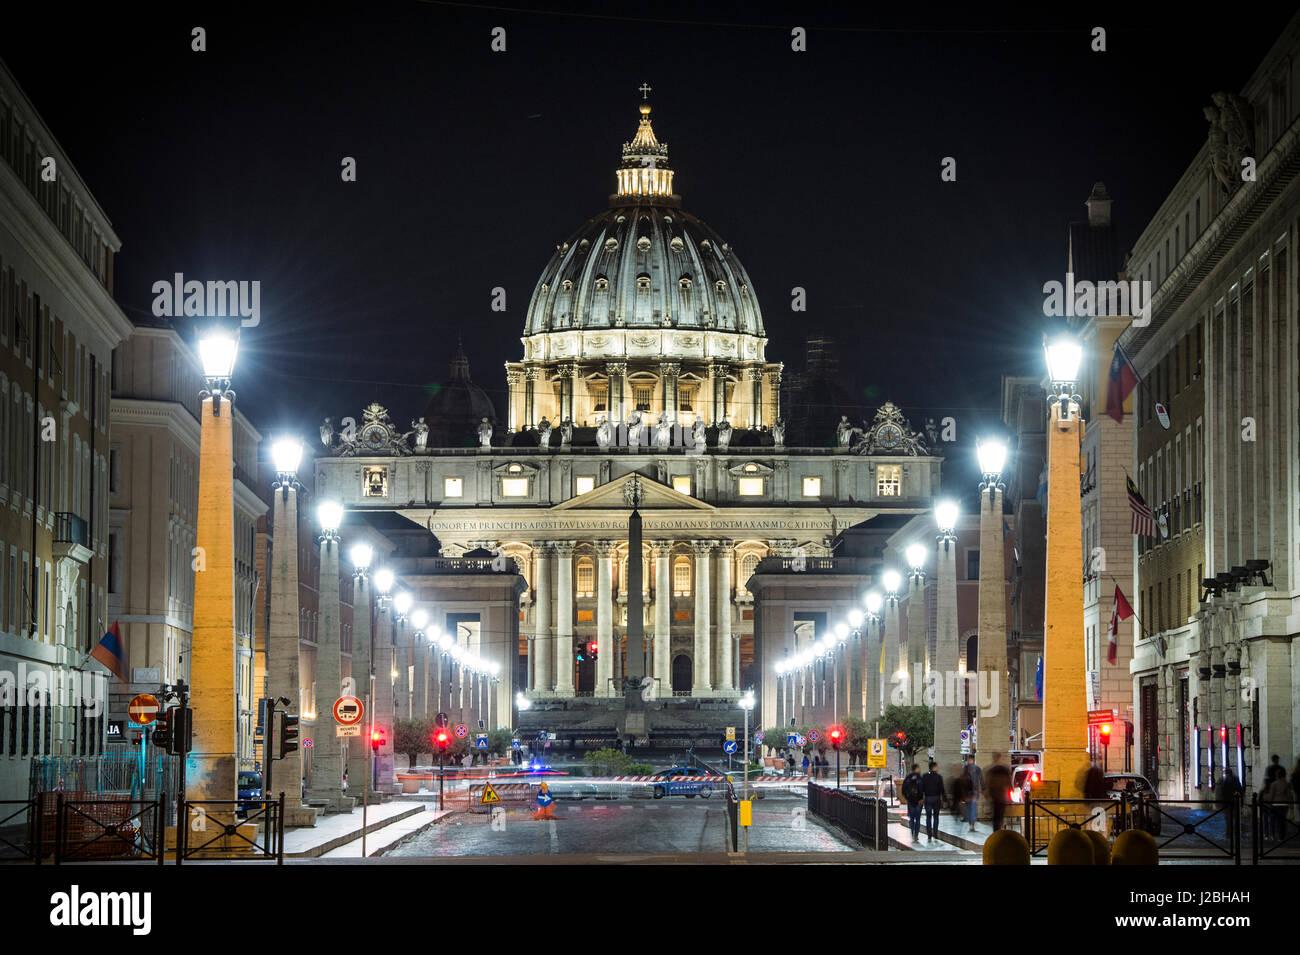 View of illuminated Saint Peter Basilica, Street Via della Conciliazione and light trails of cars in Rome, Italy - Stock Image